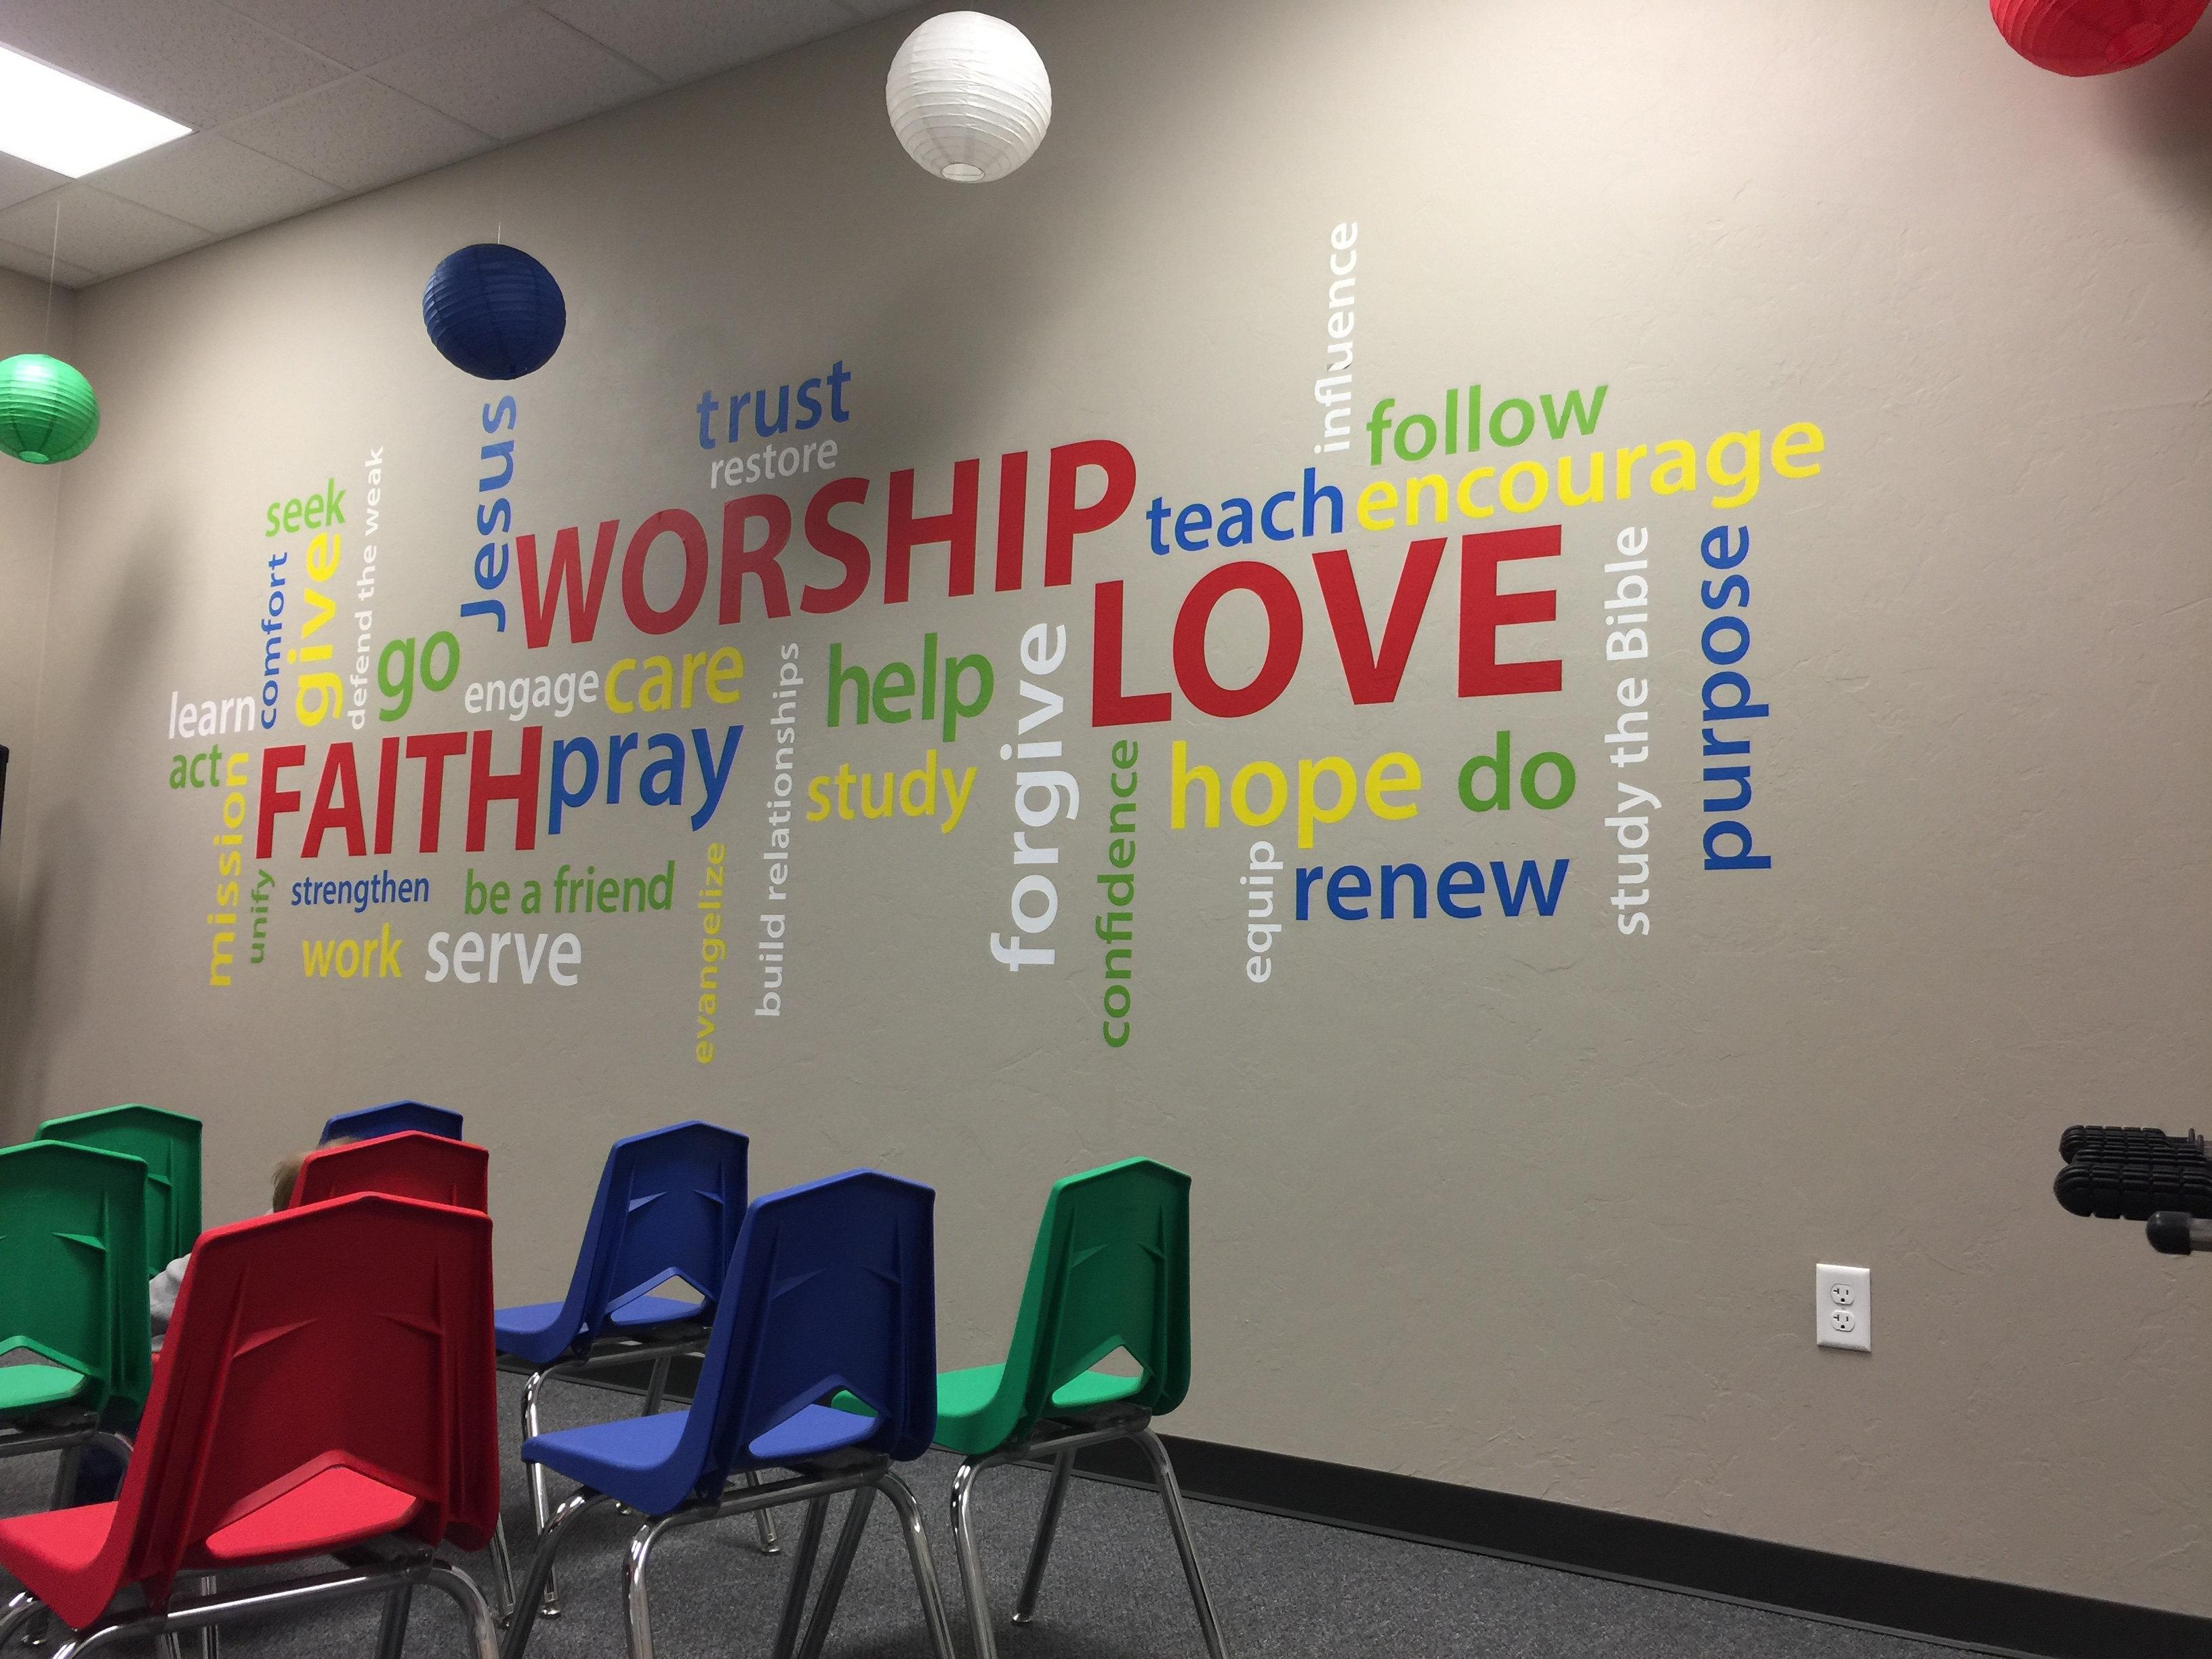 Sunday School Room Wall Decals